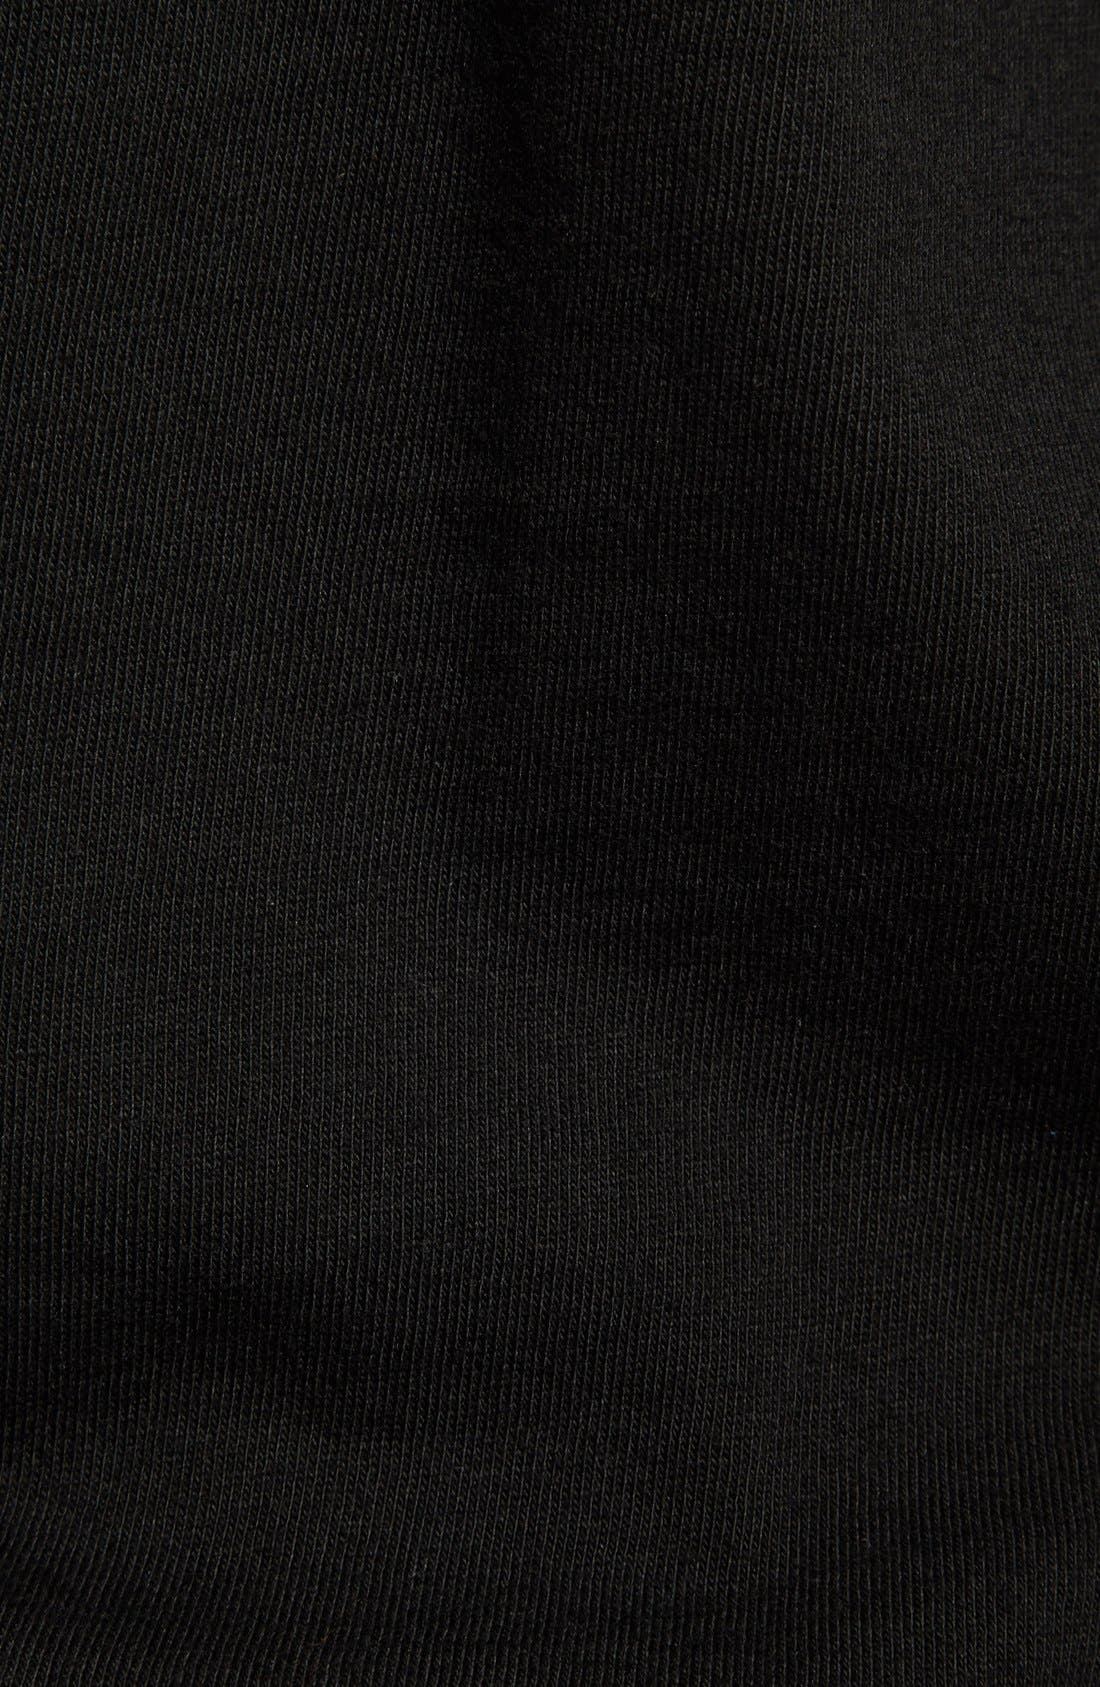 Alternate Image 3  - ELEVENPARIS 'Helvo' T-Shirt